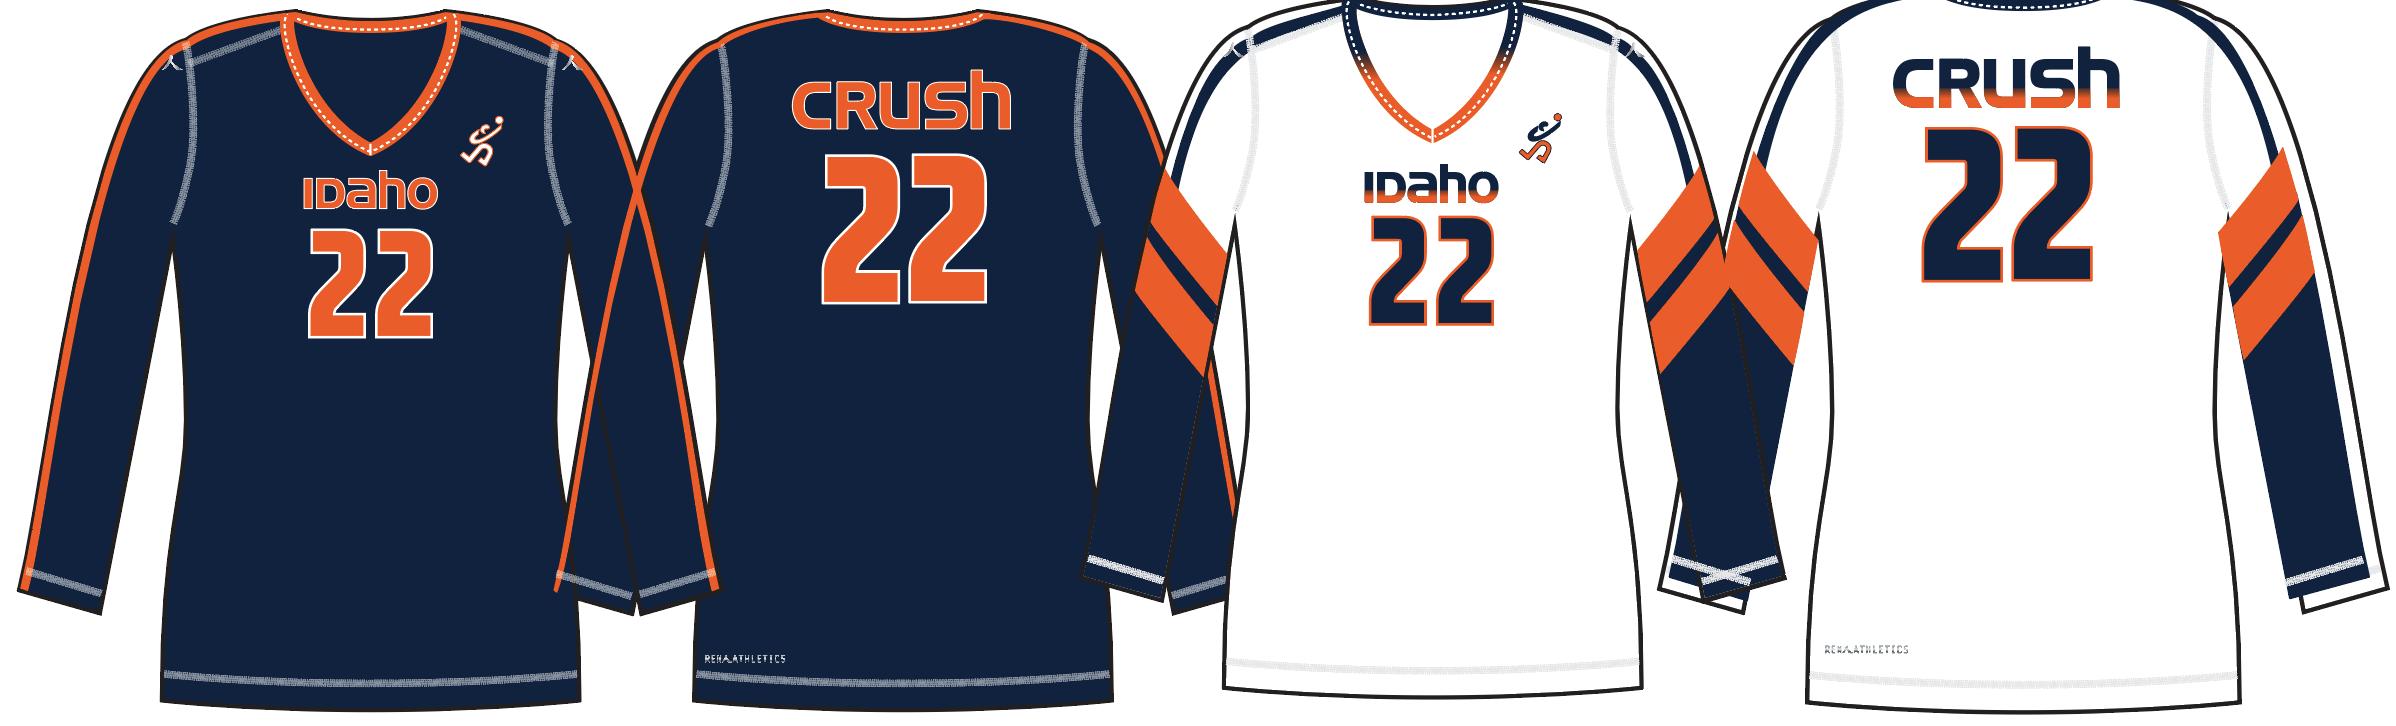 Idaho Crush Custom Uniforms